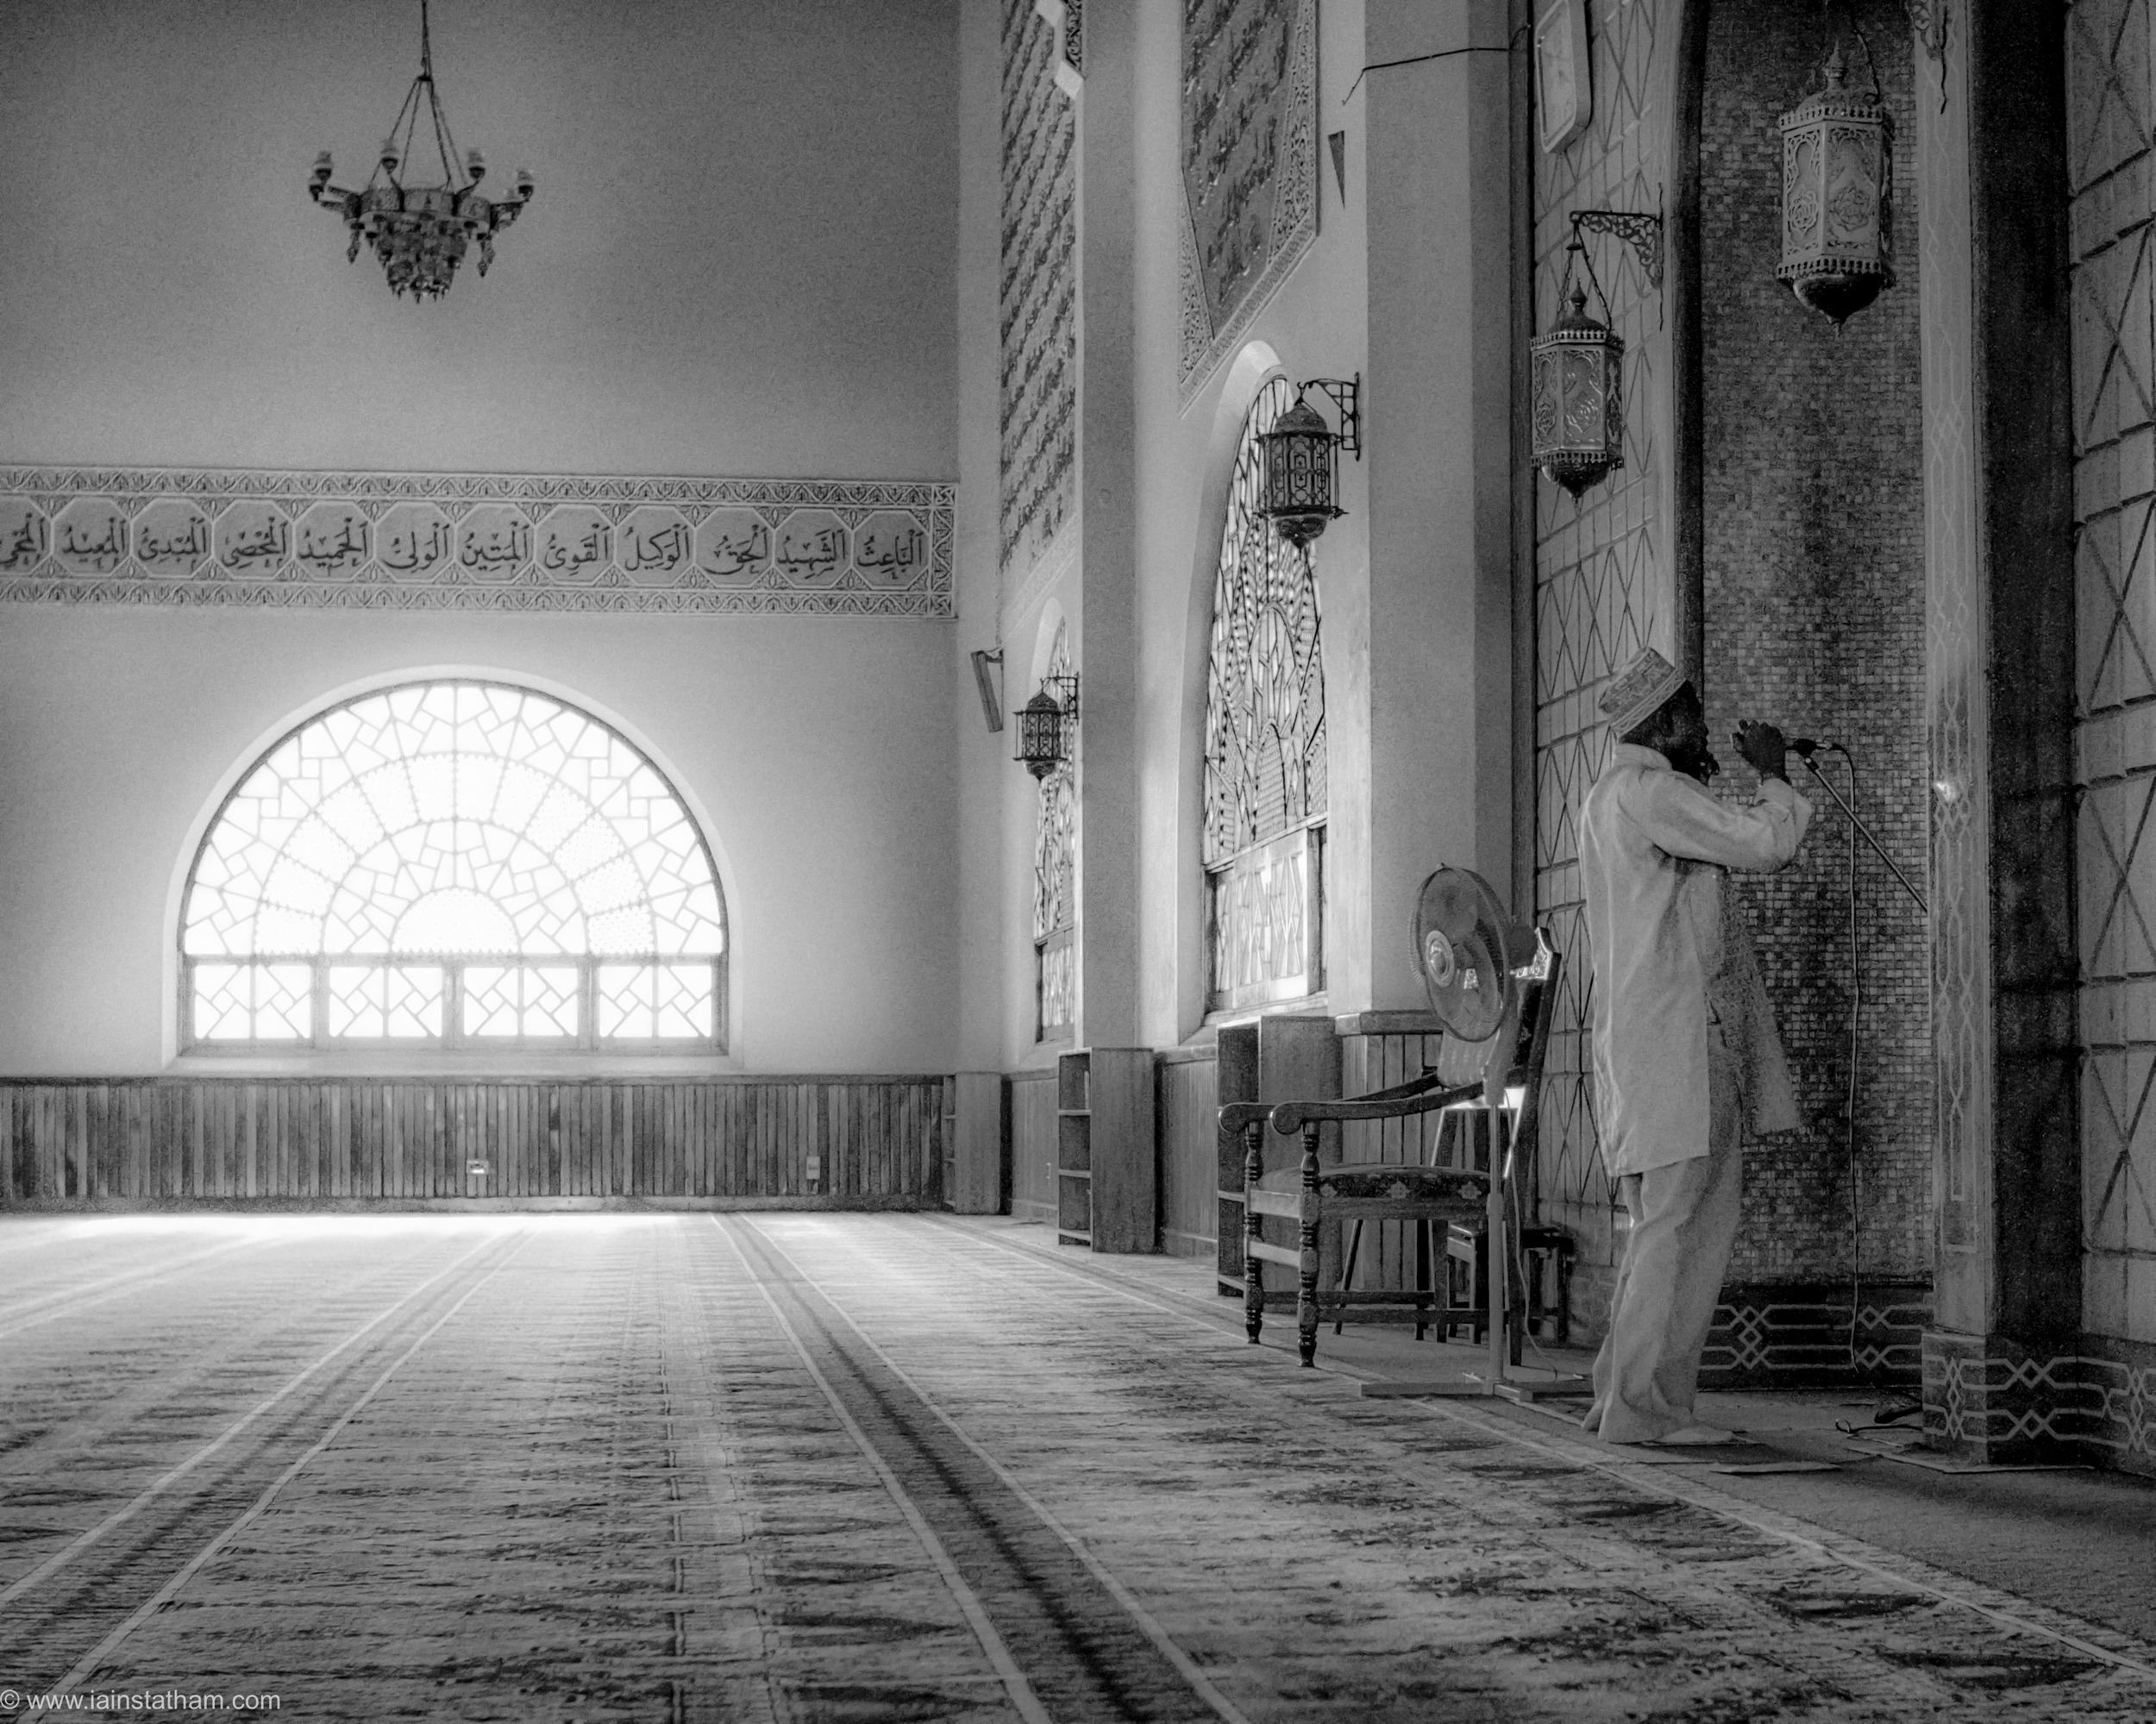 ug - kampala - gadaffi mosque - bw-3.jpg